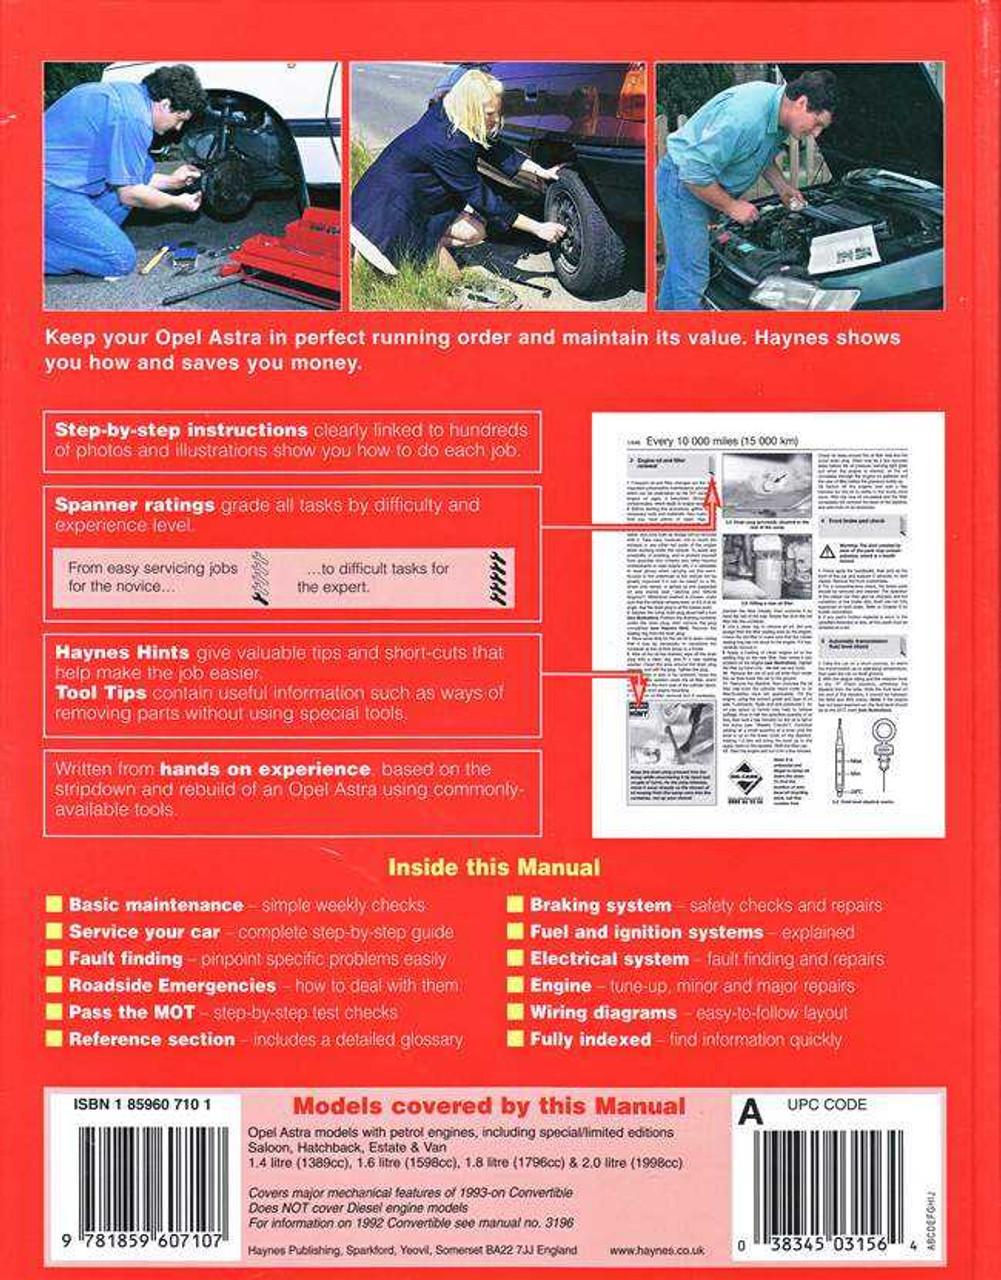 opel astra 2002 service manual